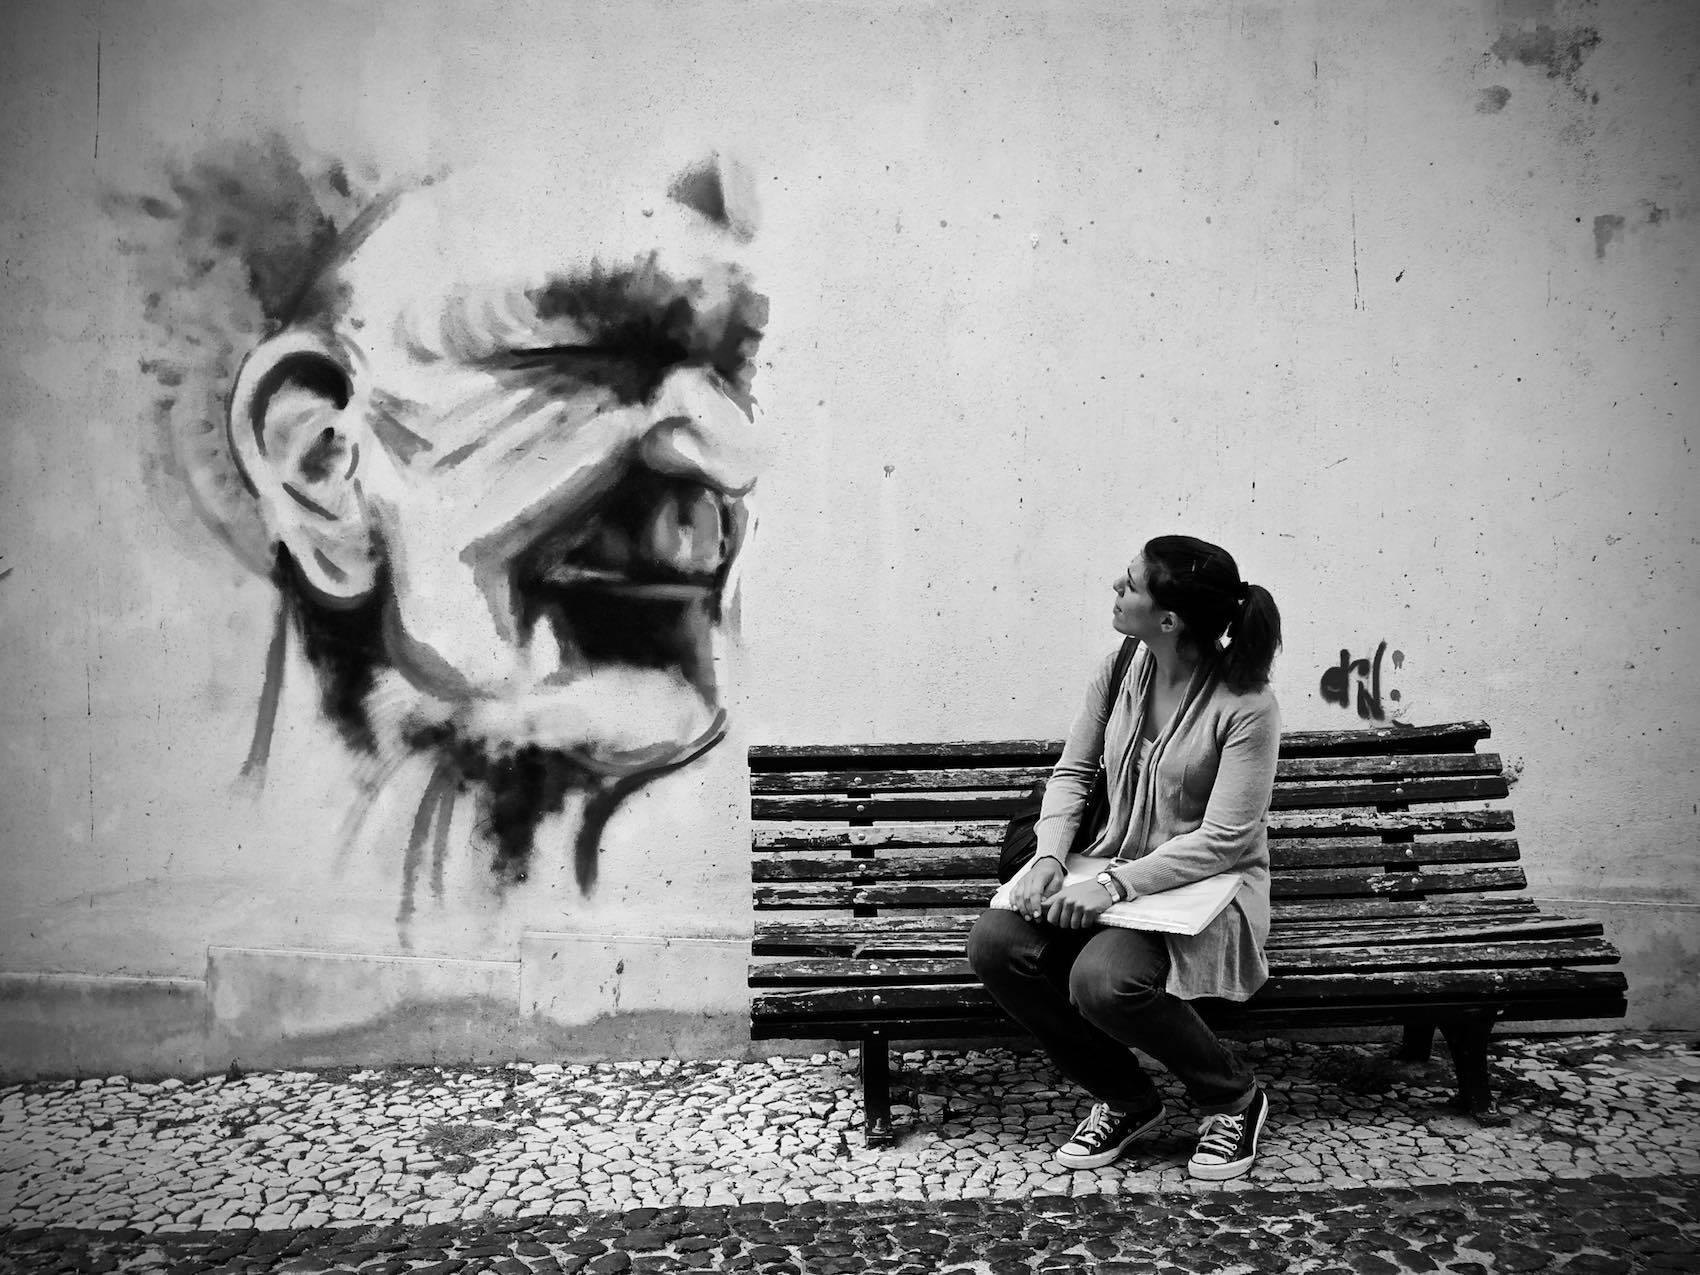 MASSIMILIANO SCARPA photographer- Portogallo Lisbona 2012